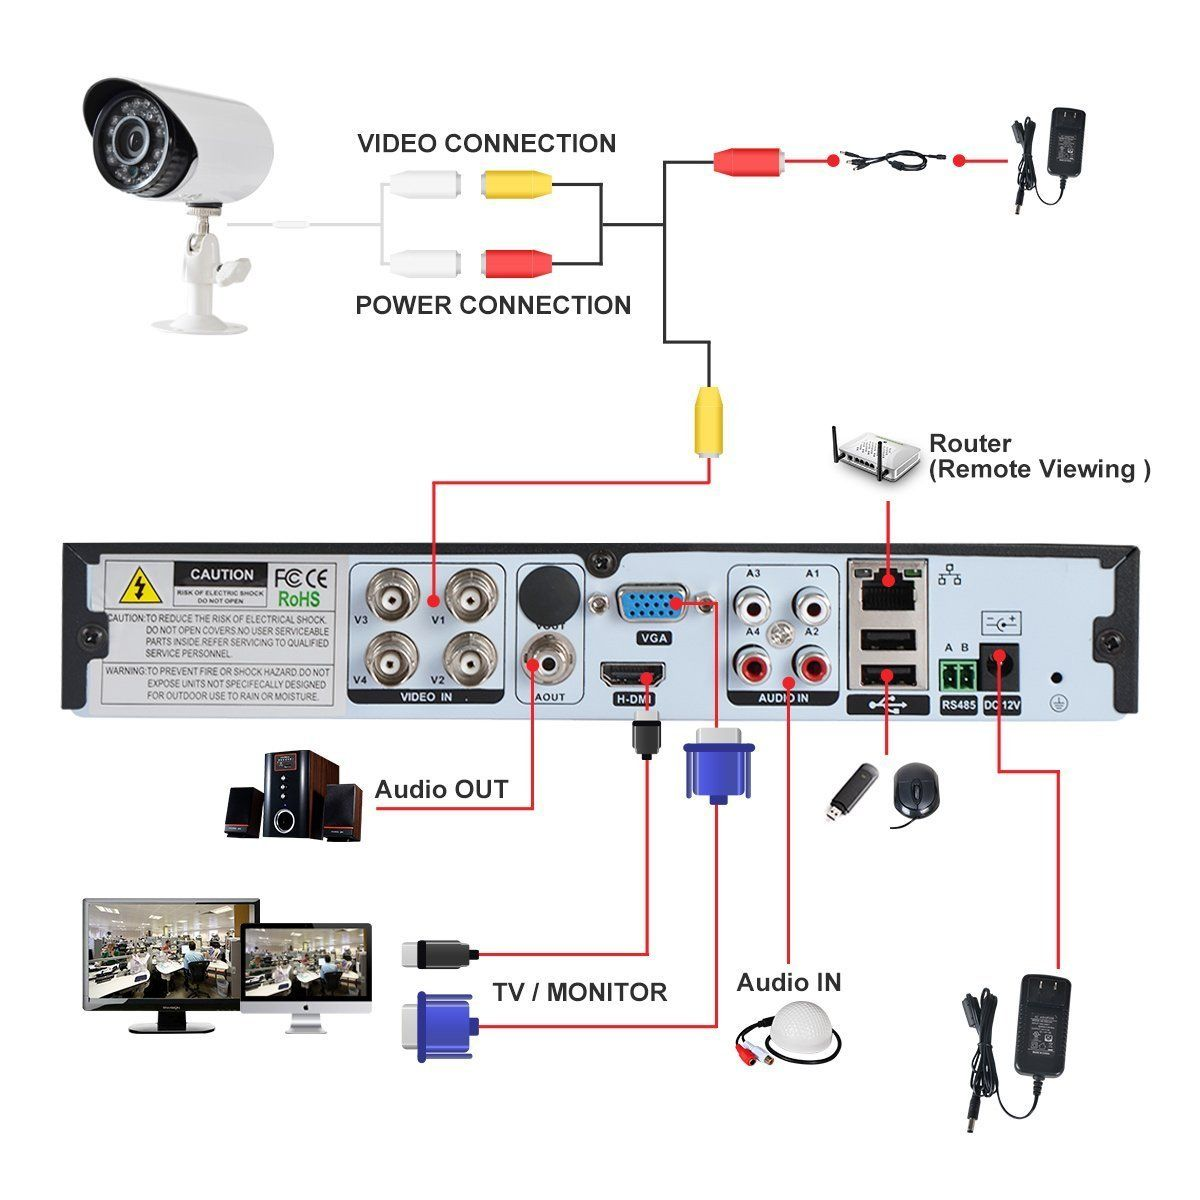 Amazon : JOOAN TC404AHD4A 4CH AHD 720P CCTV Cameras